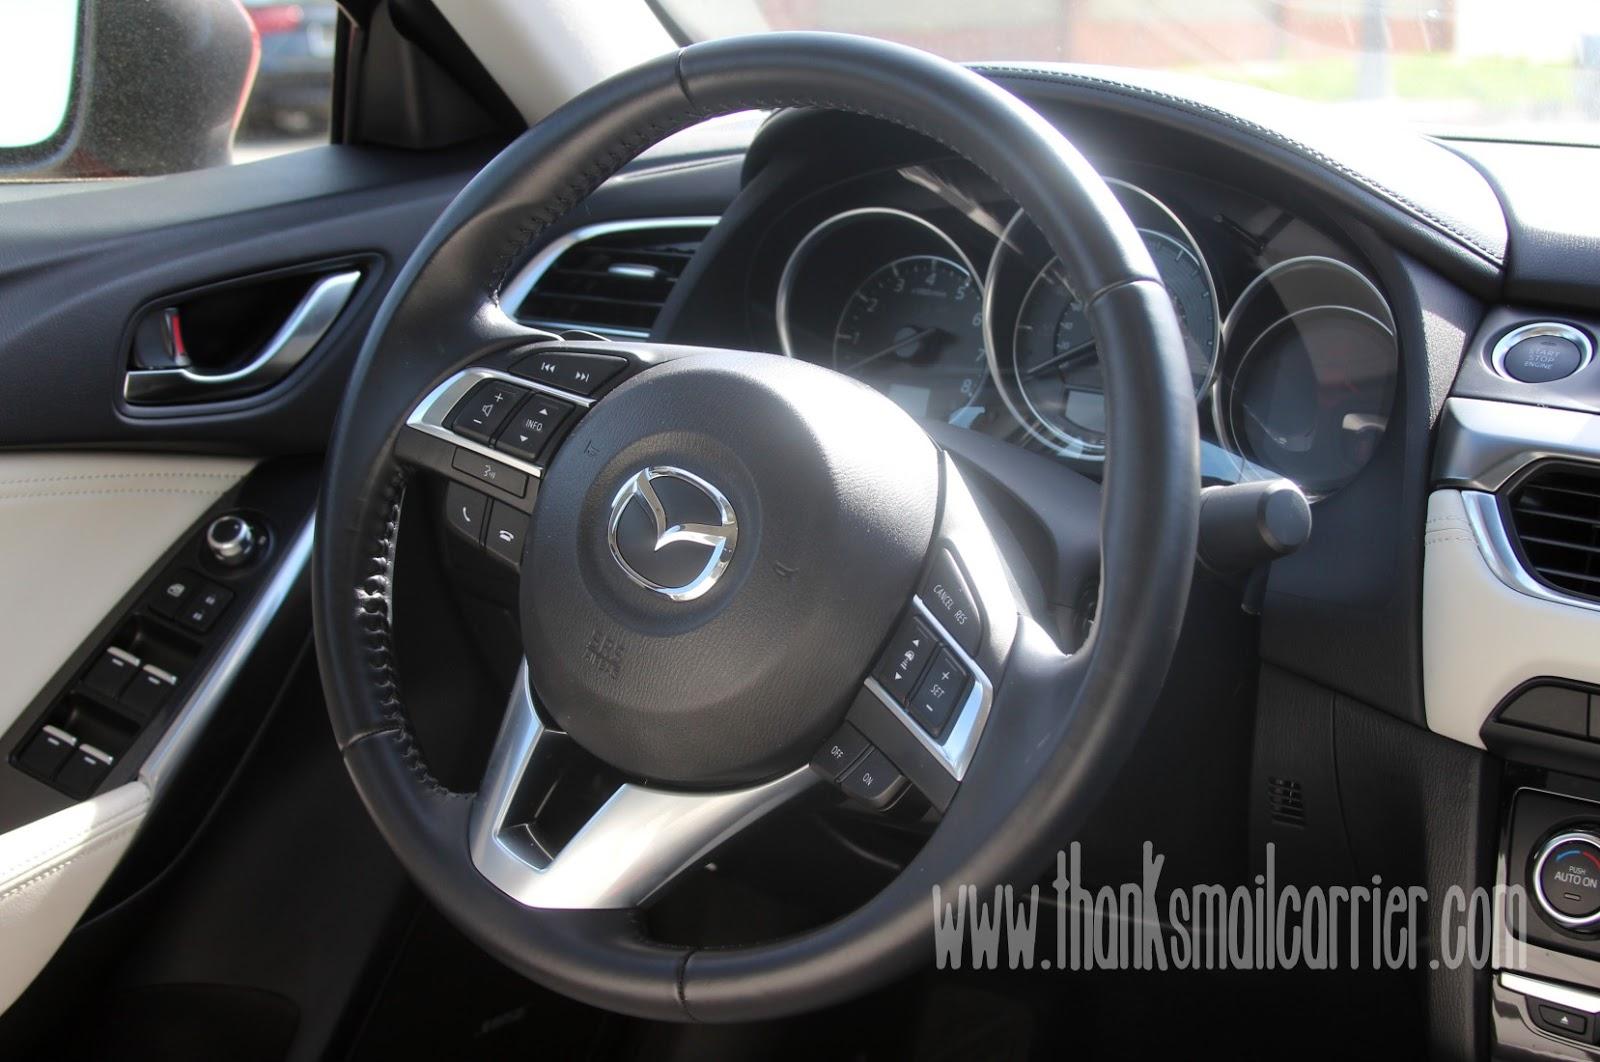 2016 Mazda6 controls